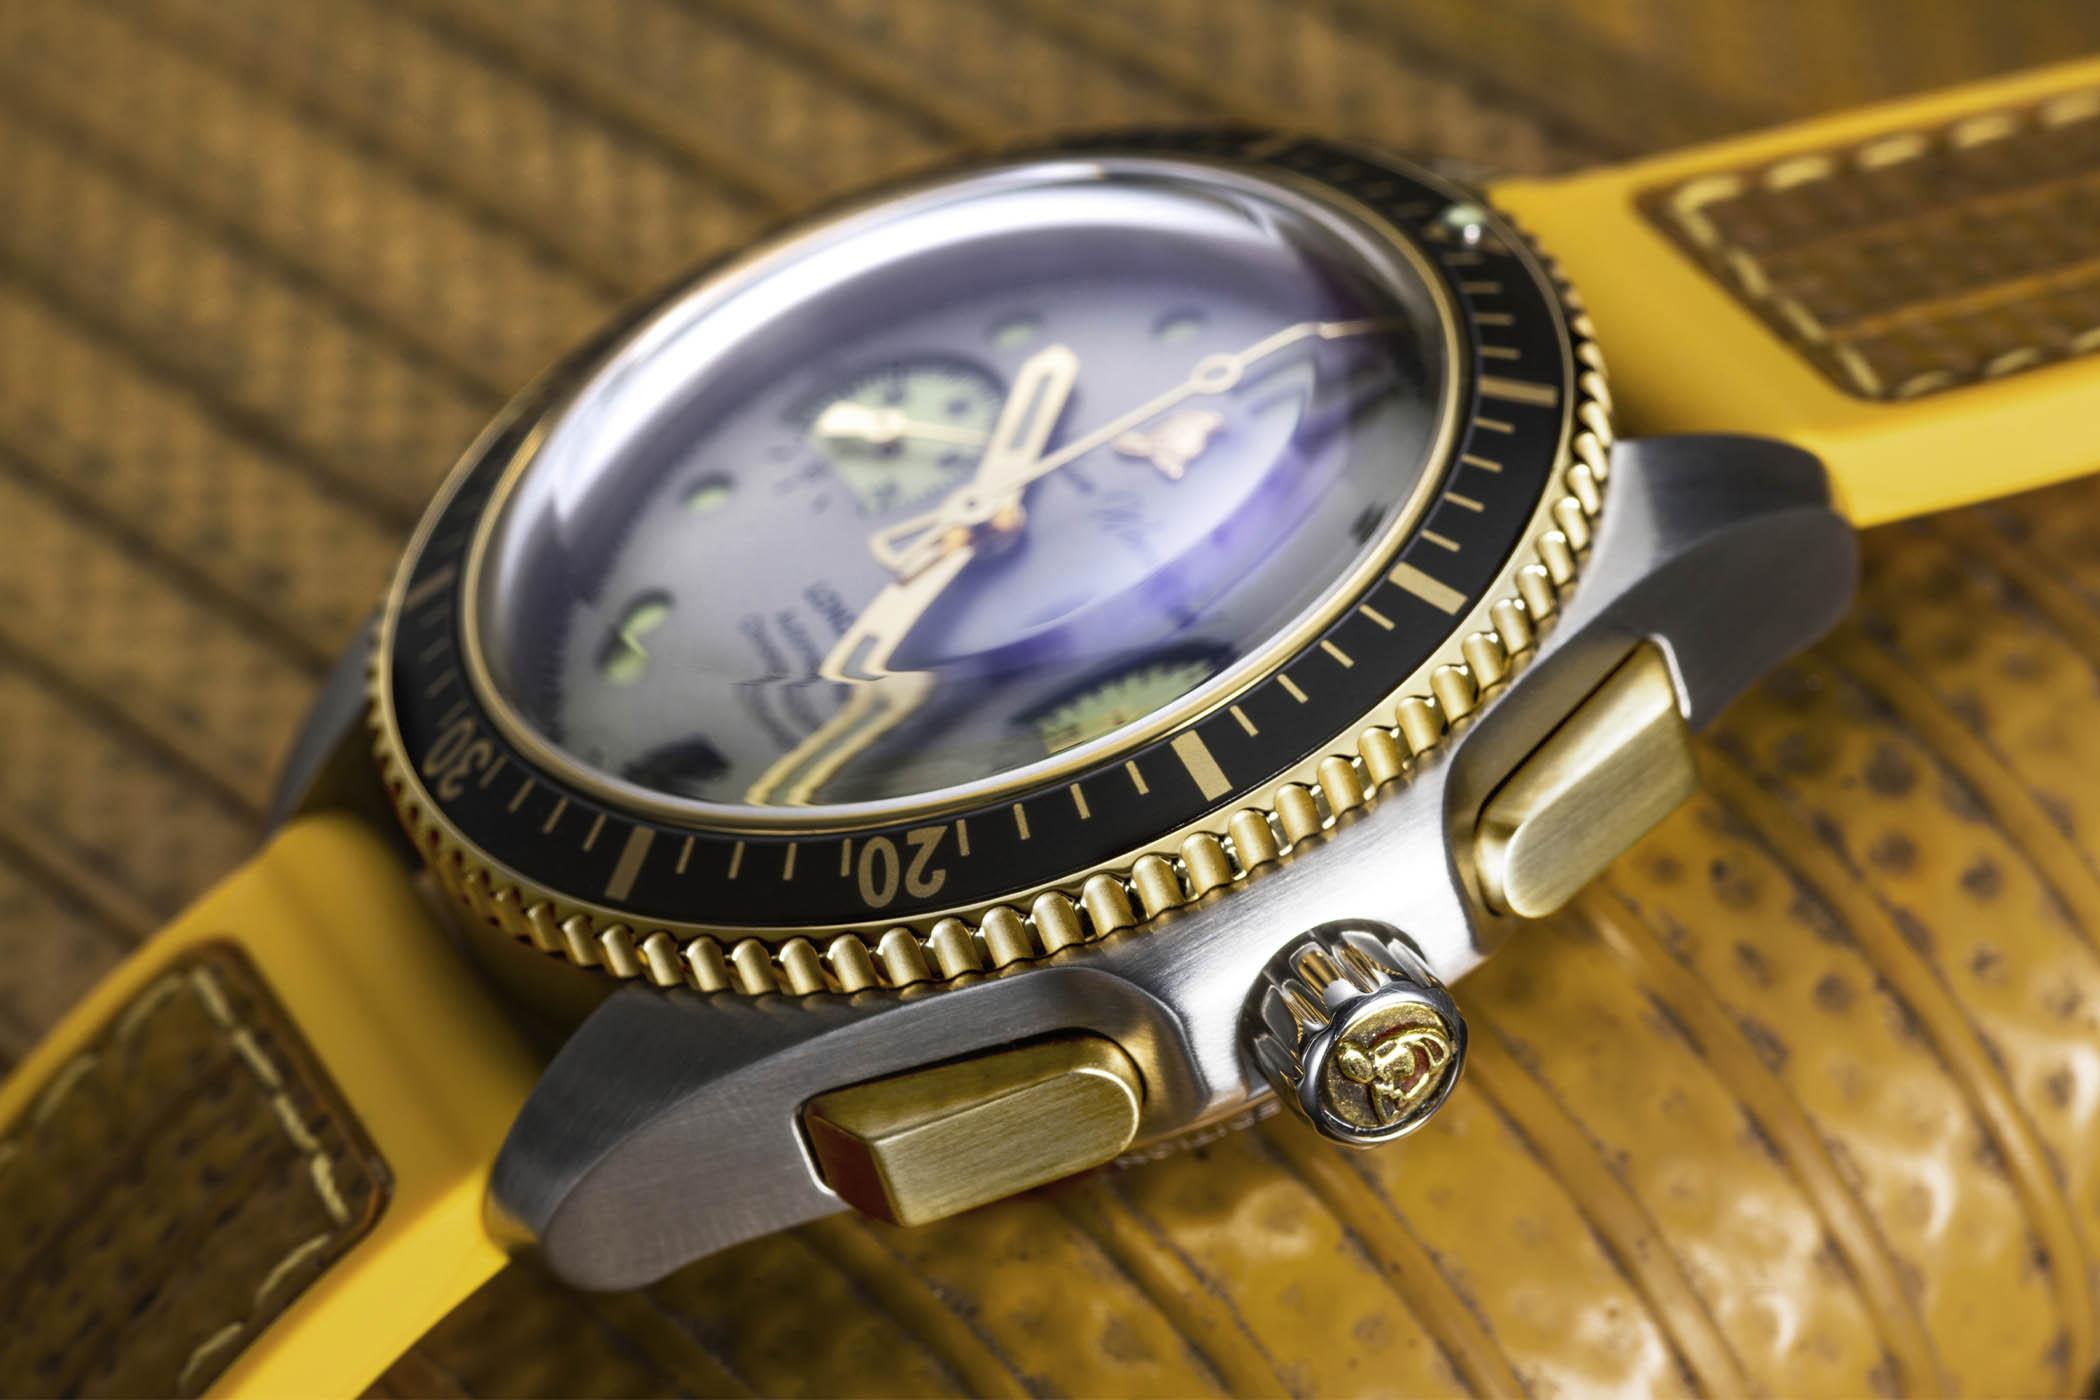 William Wood Triumph Chronograph Collection